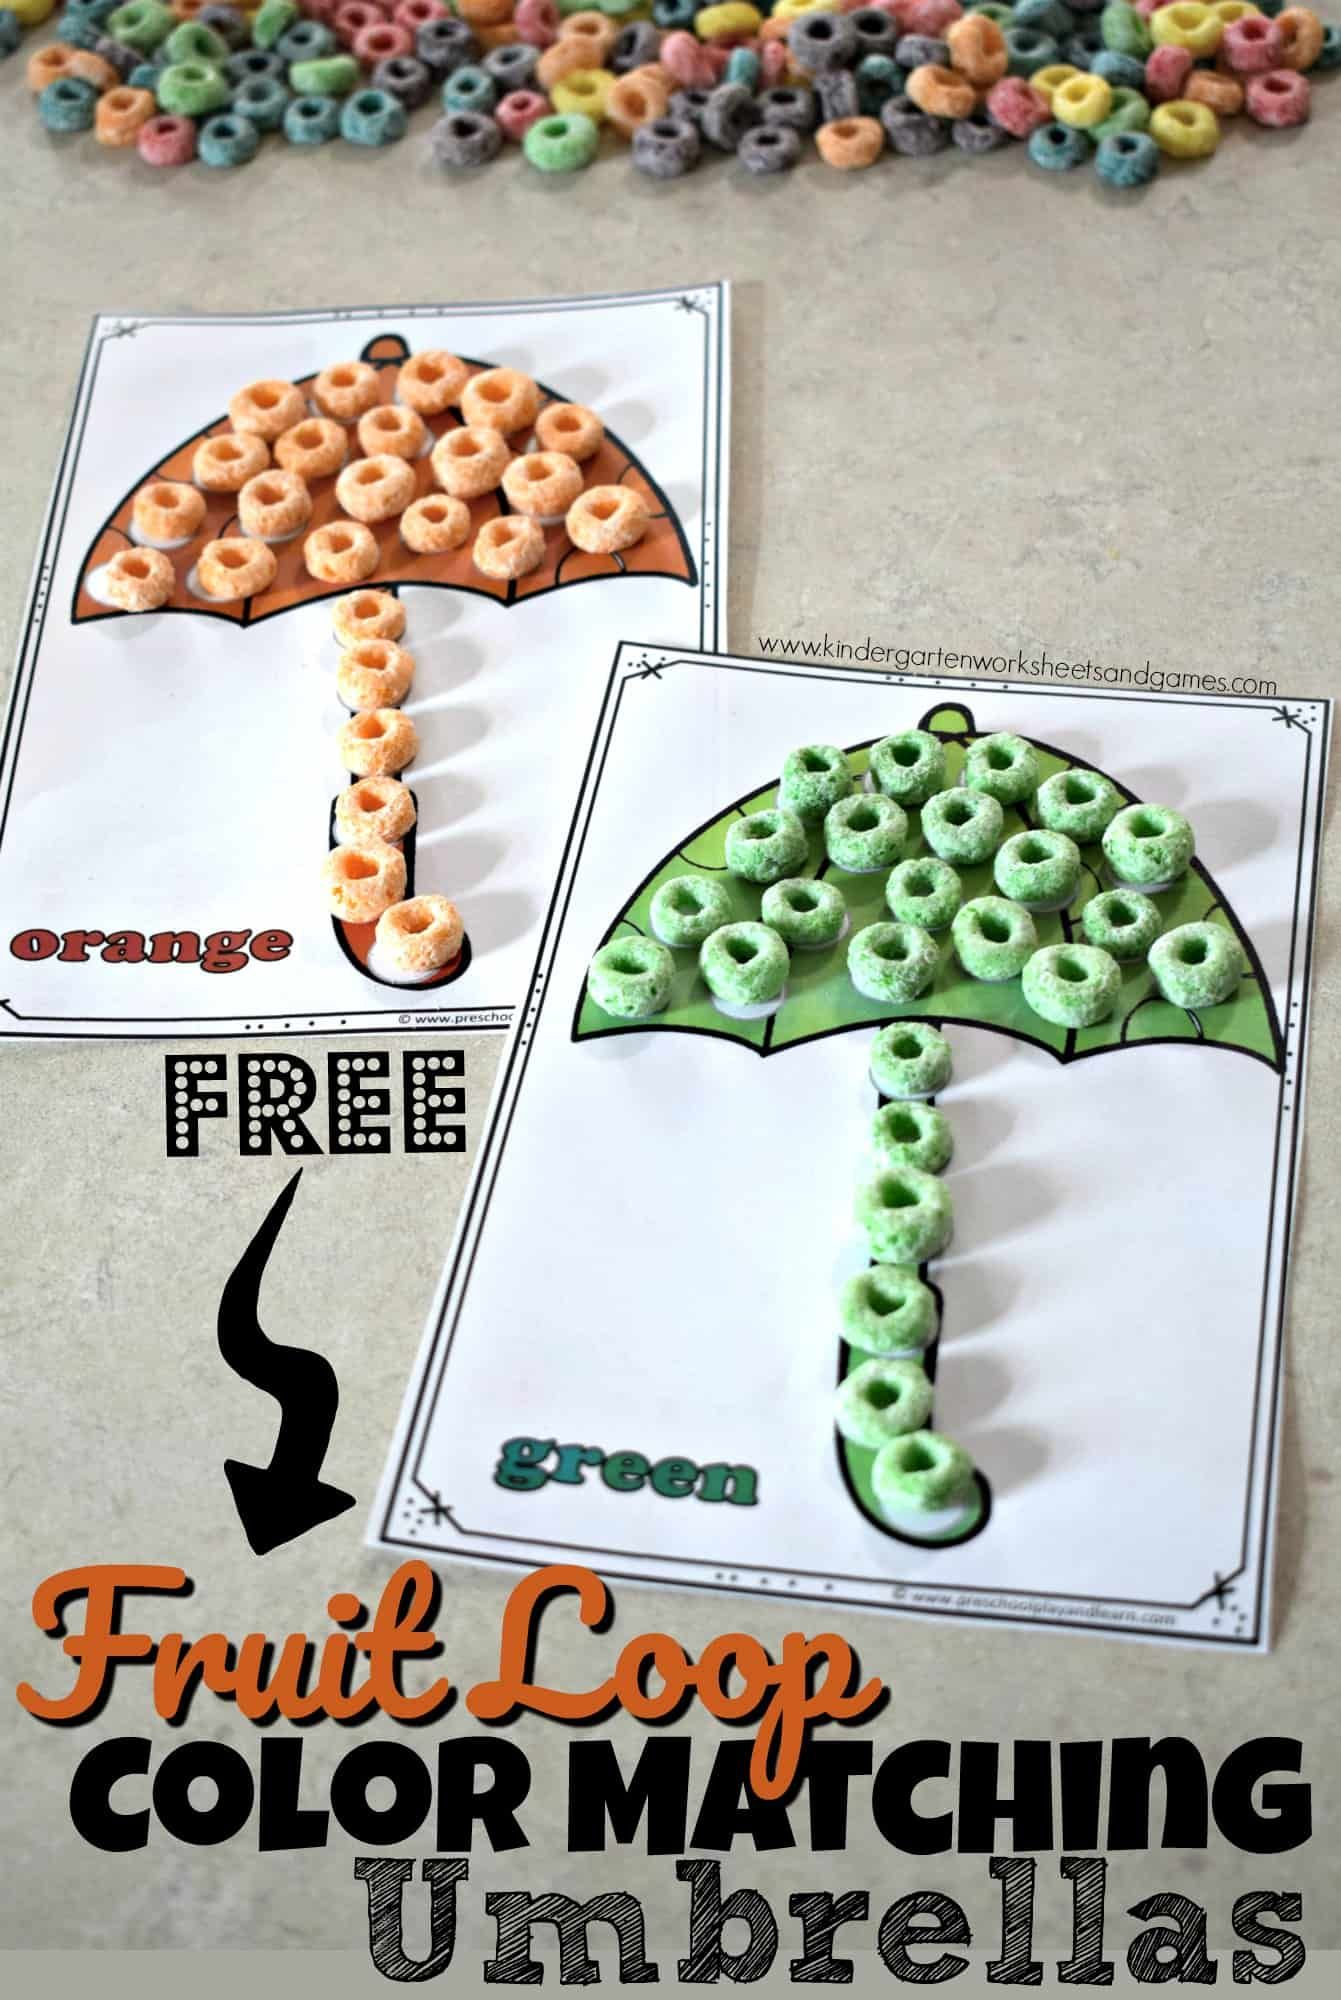 Free Fruit Loop Color Matching Umbrellas